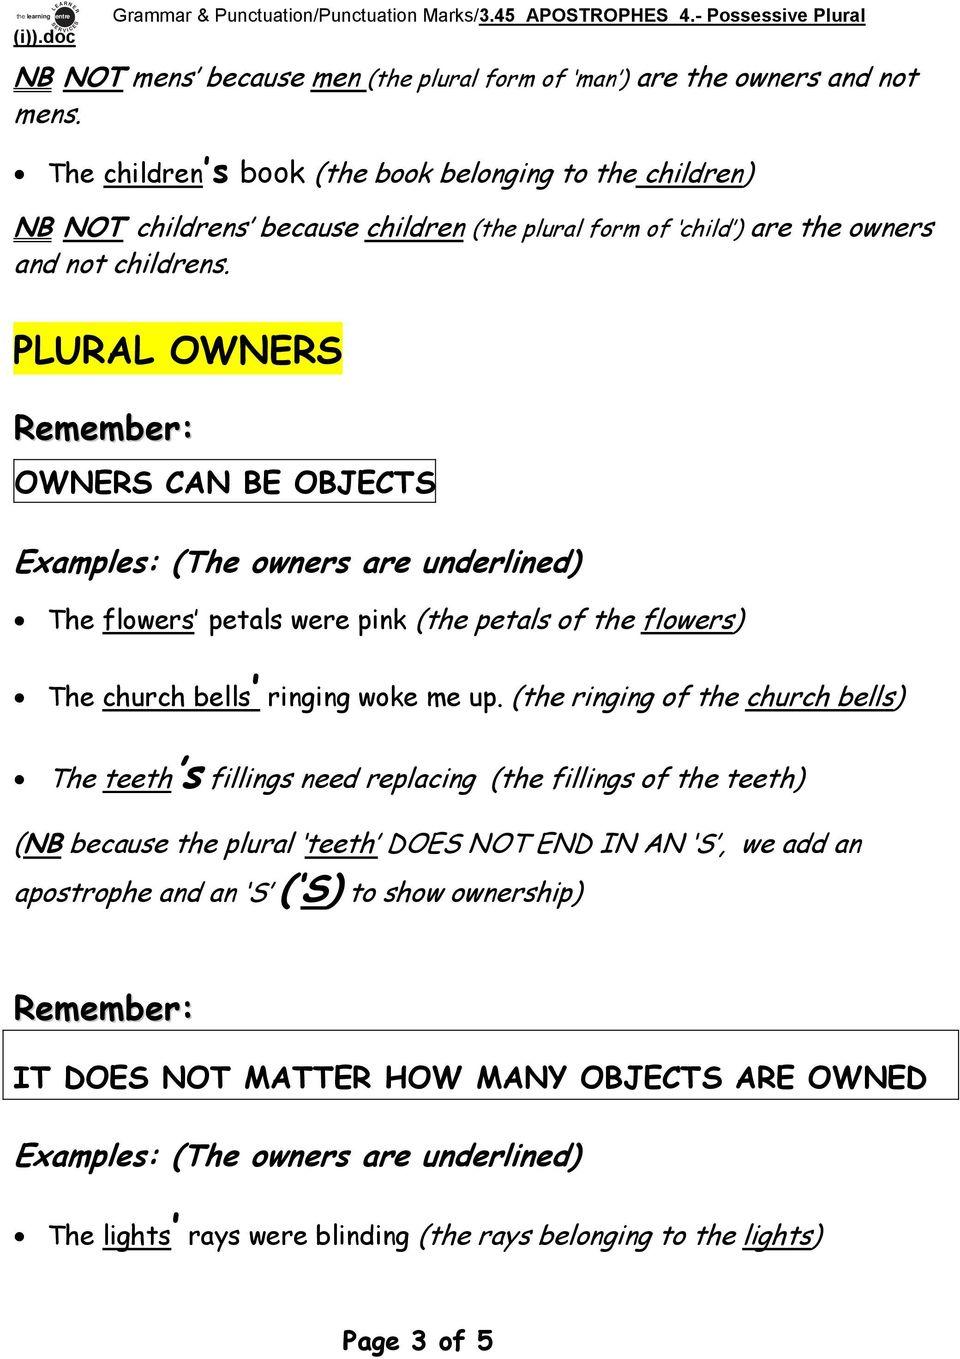 hight resolution of Grammar \u0026 Punctuation/Punctuation Marks/3.45 APOSTROPHES 4.- Possessive  Plural. APOSTROPHES 4. Possessive Plural (i) - PDF Free Download